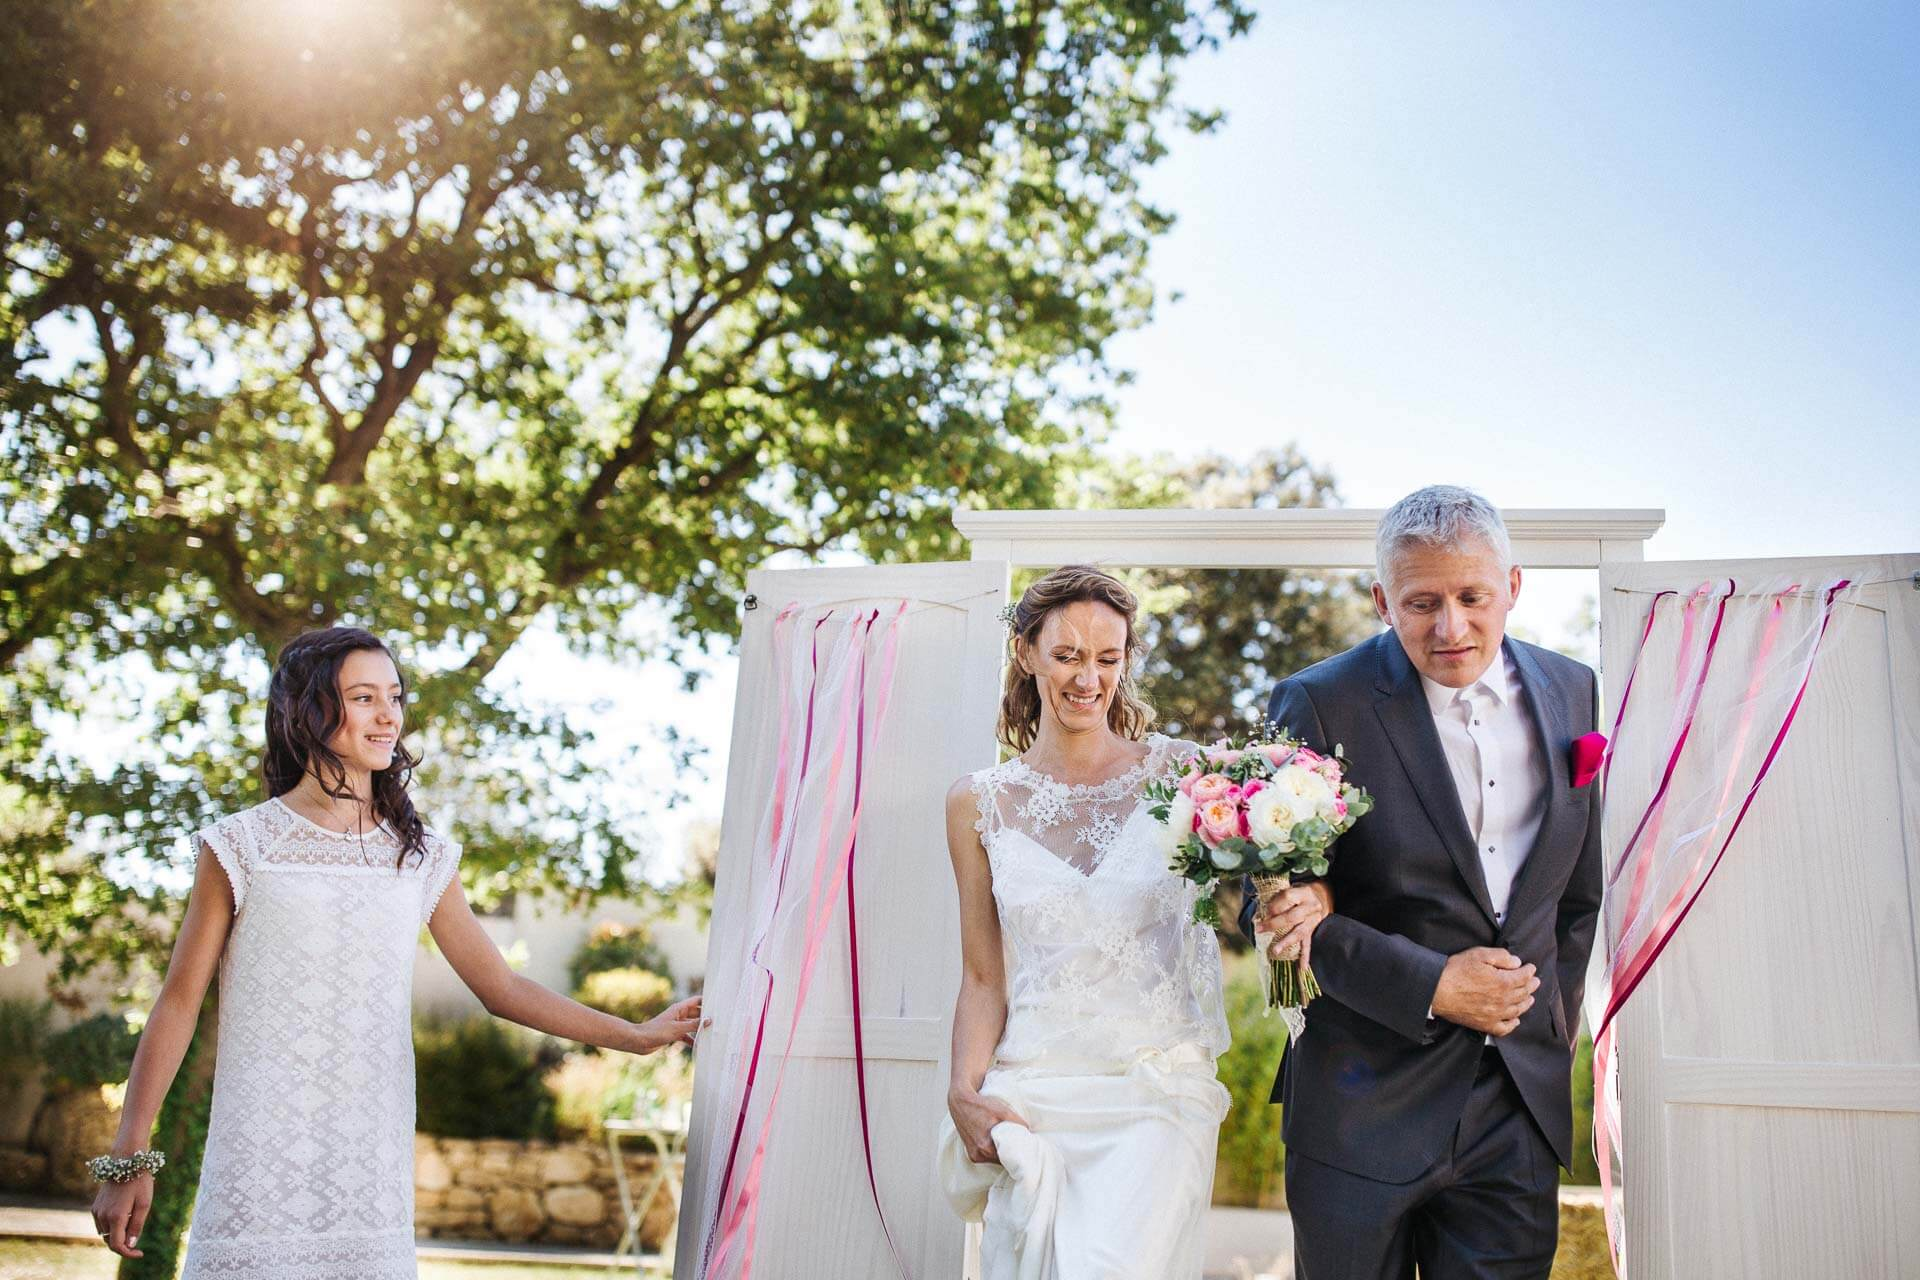 photographe-mariage-aix-en-provence-stephanie-jerome-10